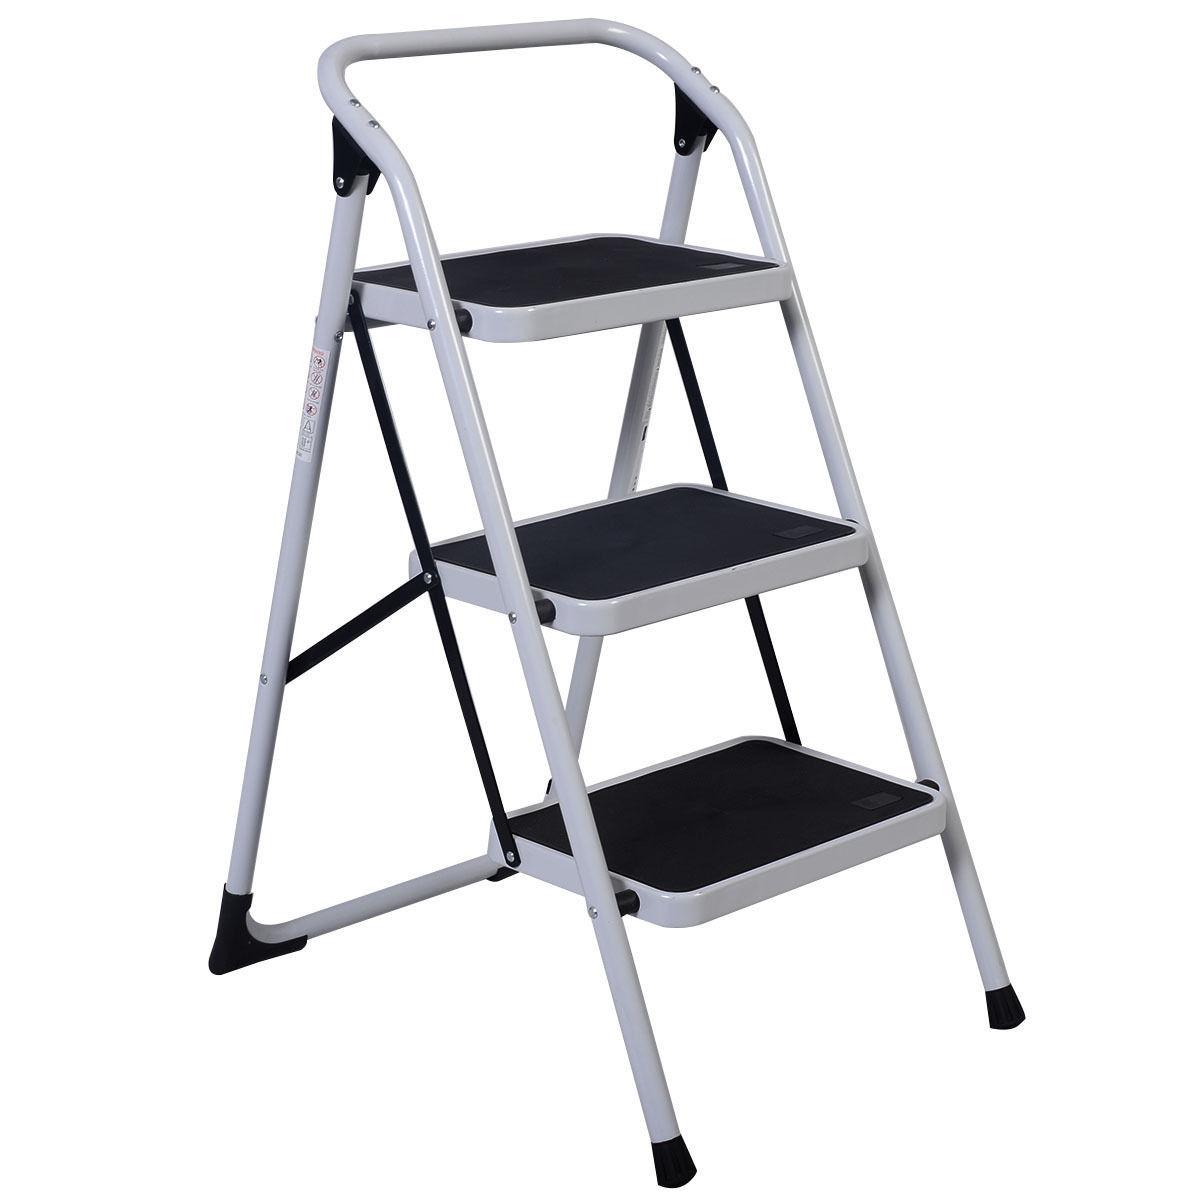 HD 3 Step Ladder Platform Lightweight Folding Stool - $38.95 + Free Shipping